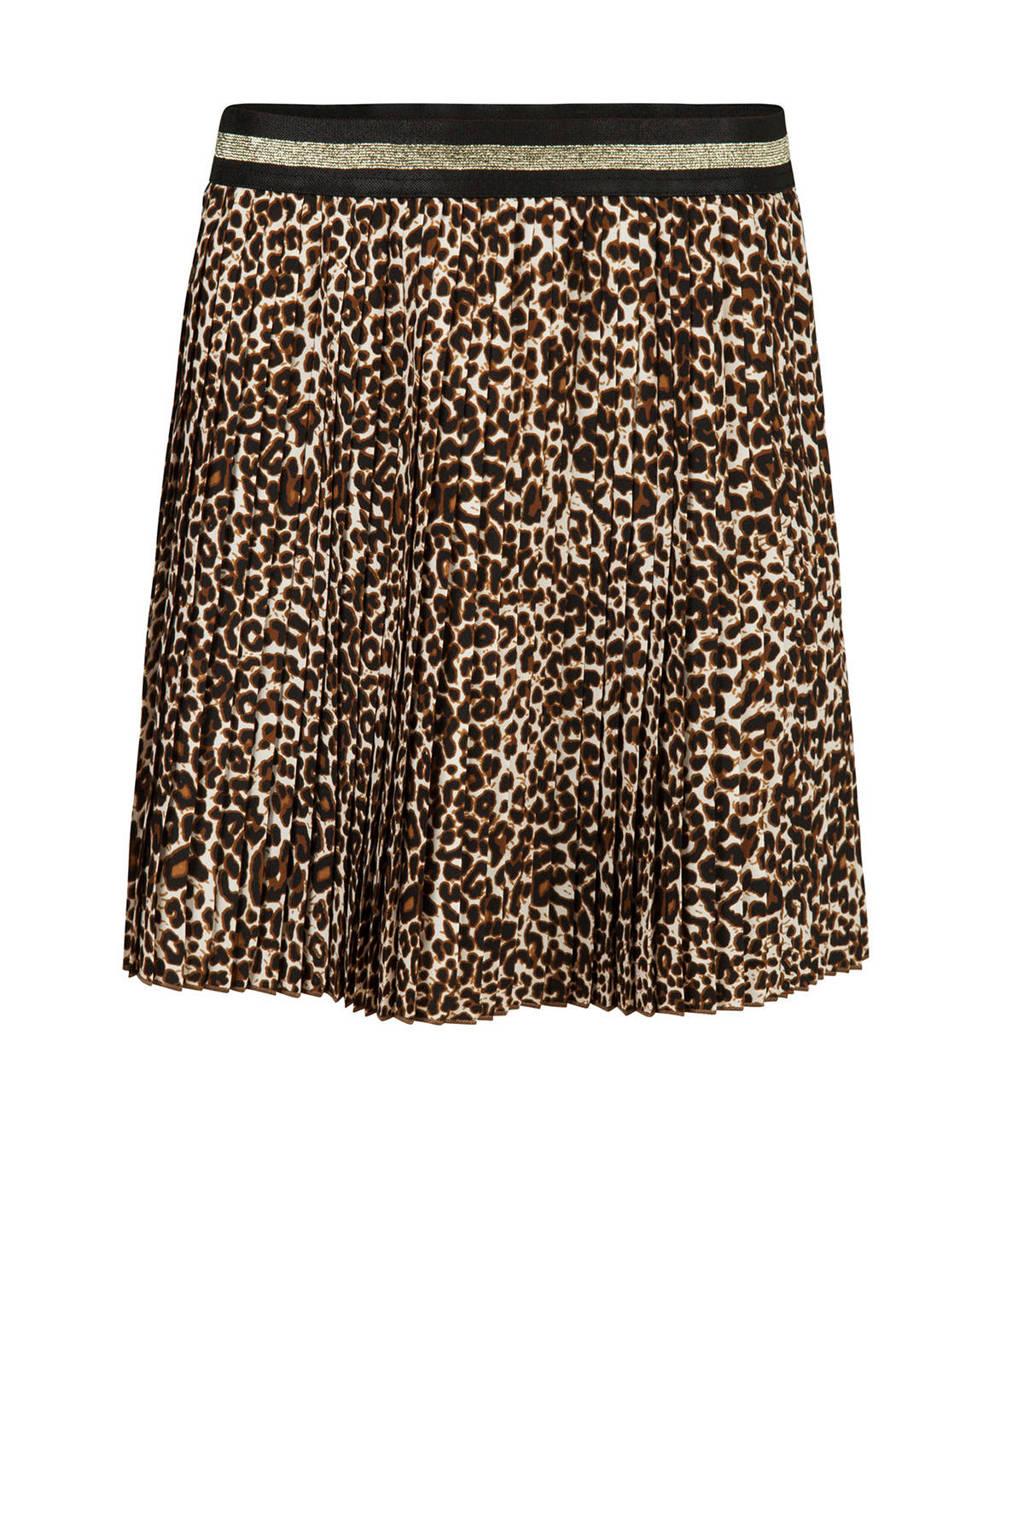 WE Fashion plissé rok met all over panterprint bruin, Leather Brown